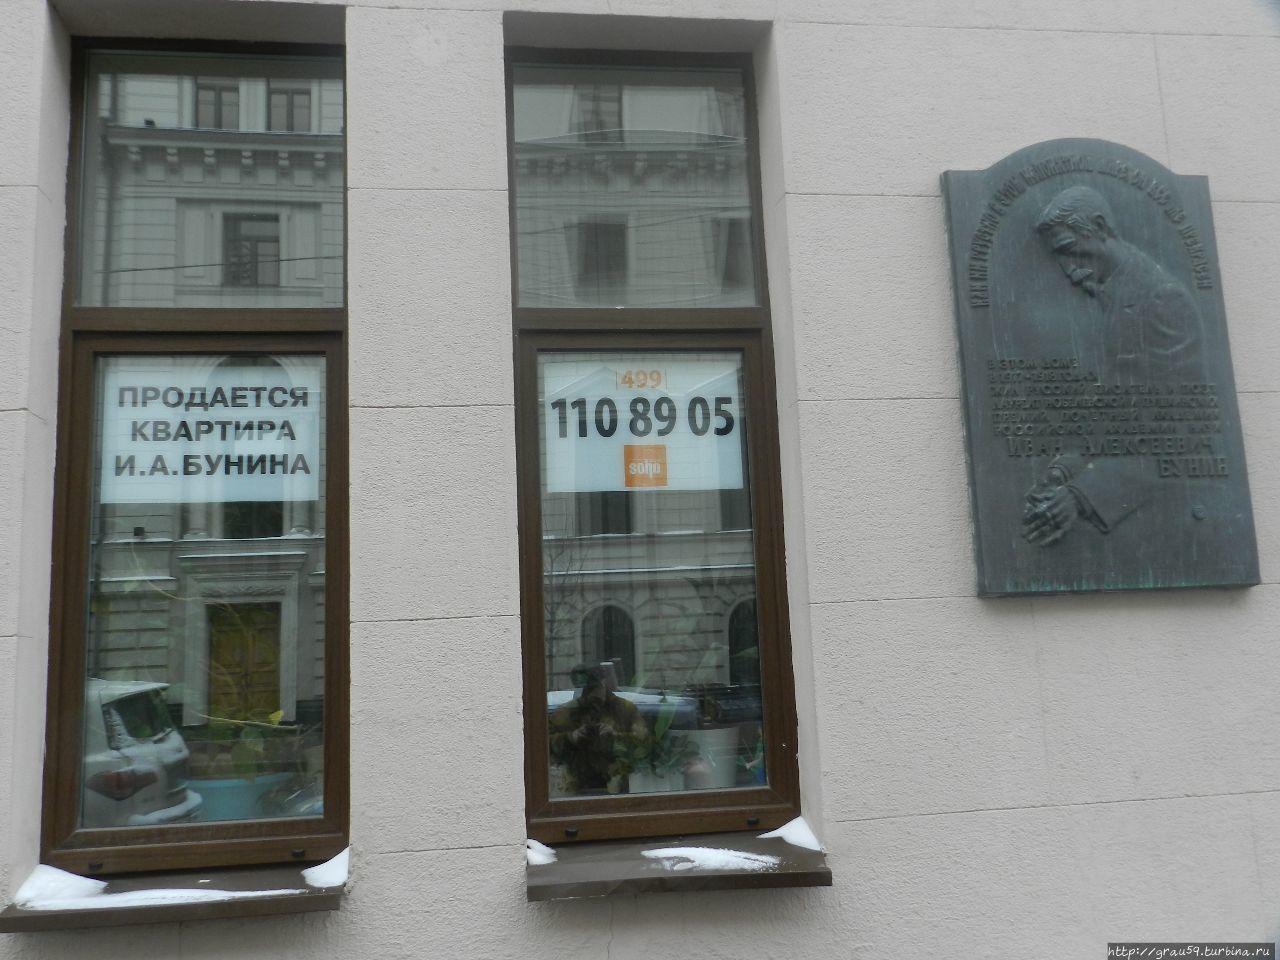 Московские треволнения Ивана Алексеевича Бунина Москва, Россия